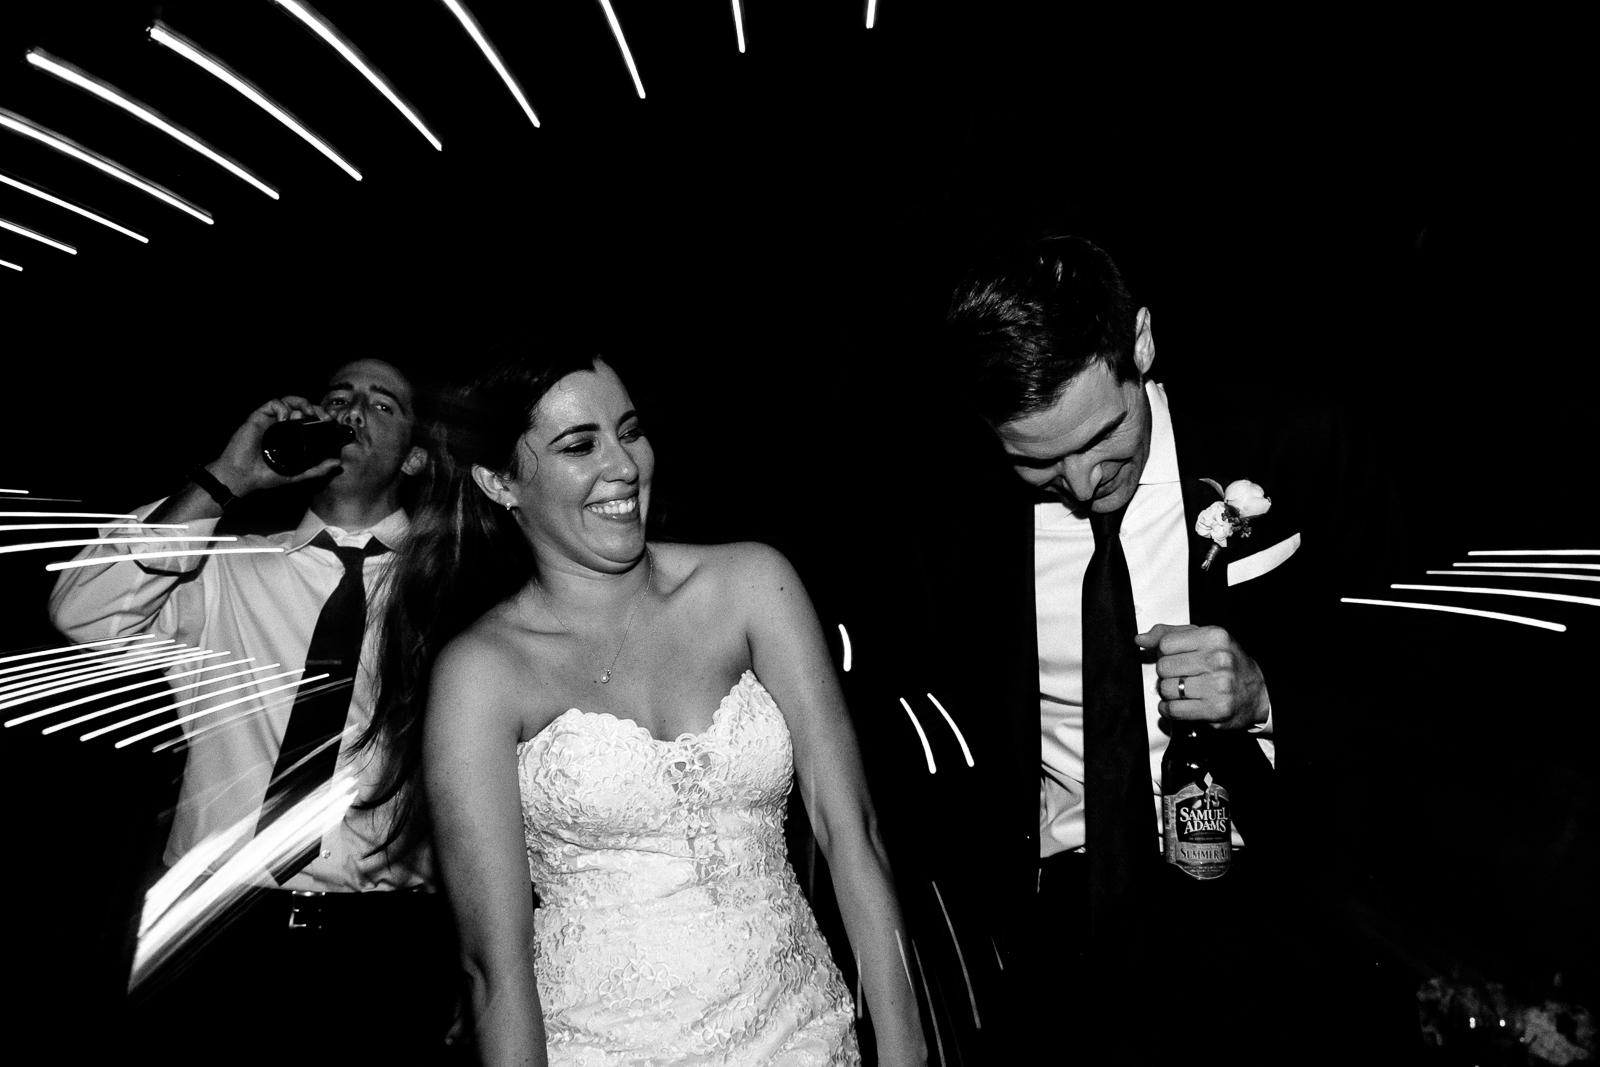 Amanda_&_Steve_Wedding_Darlington_House_La_Jolla_2015_IMG_7722.JPG